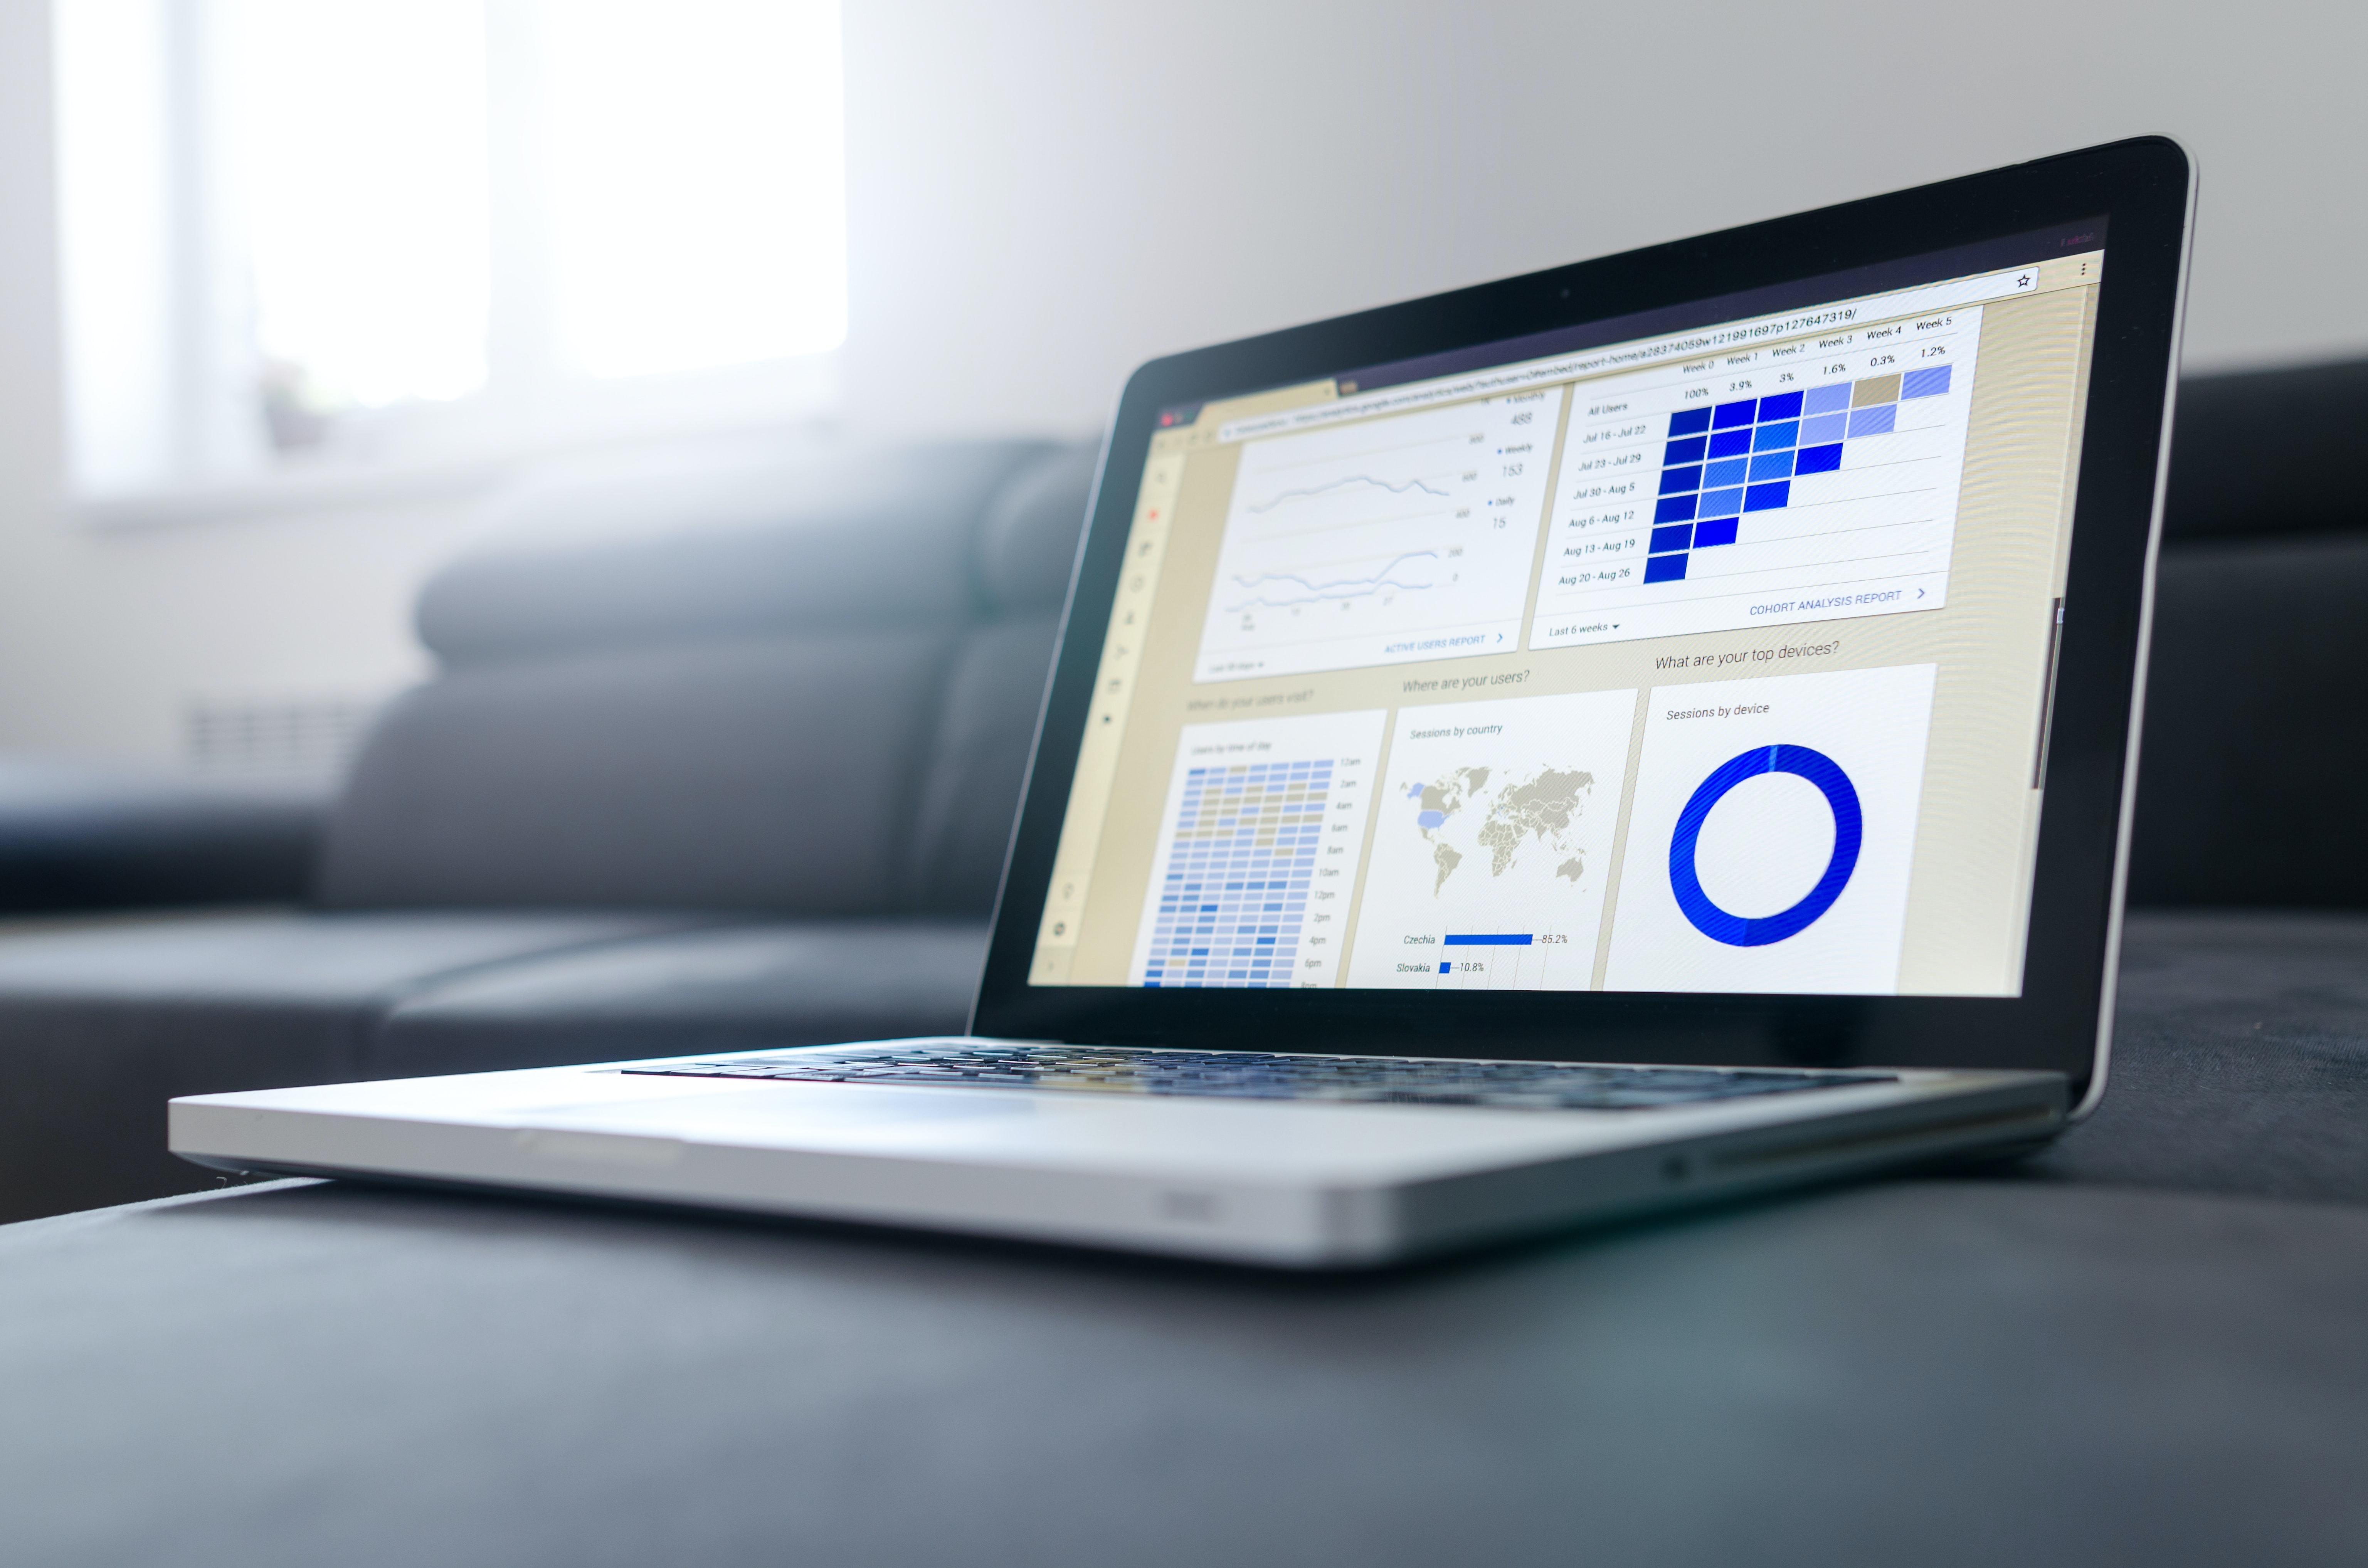 Analytics dashboard open on Macbook screen